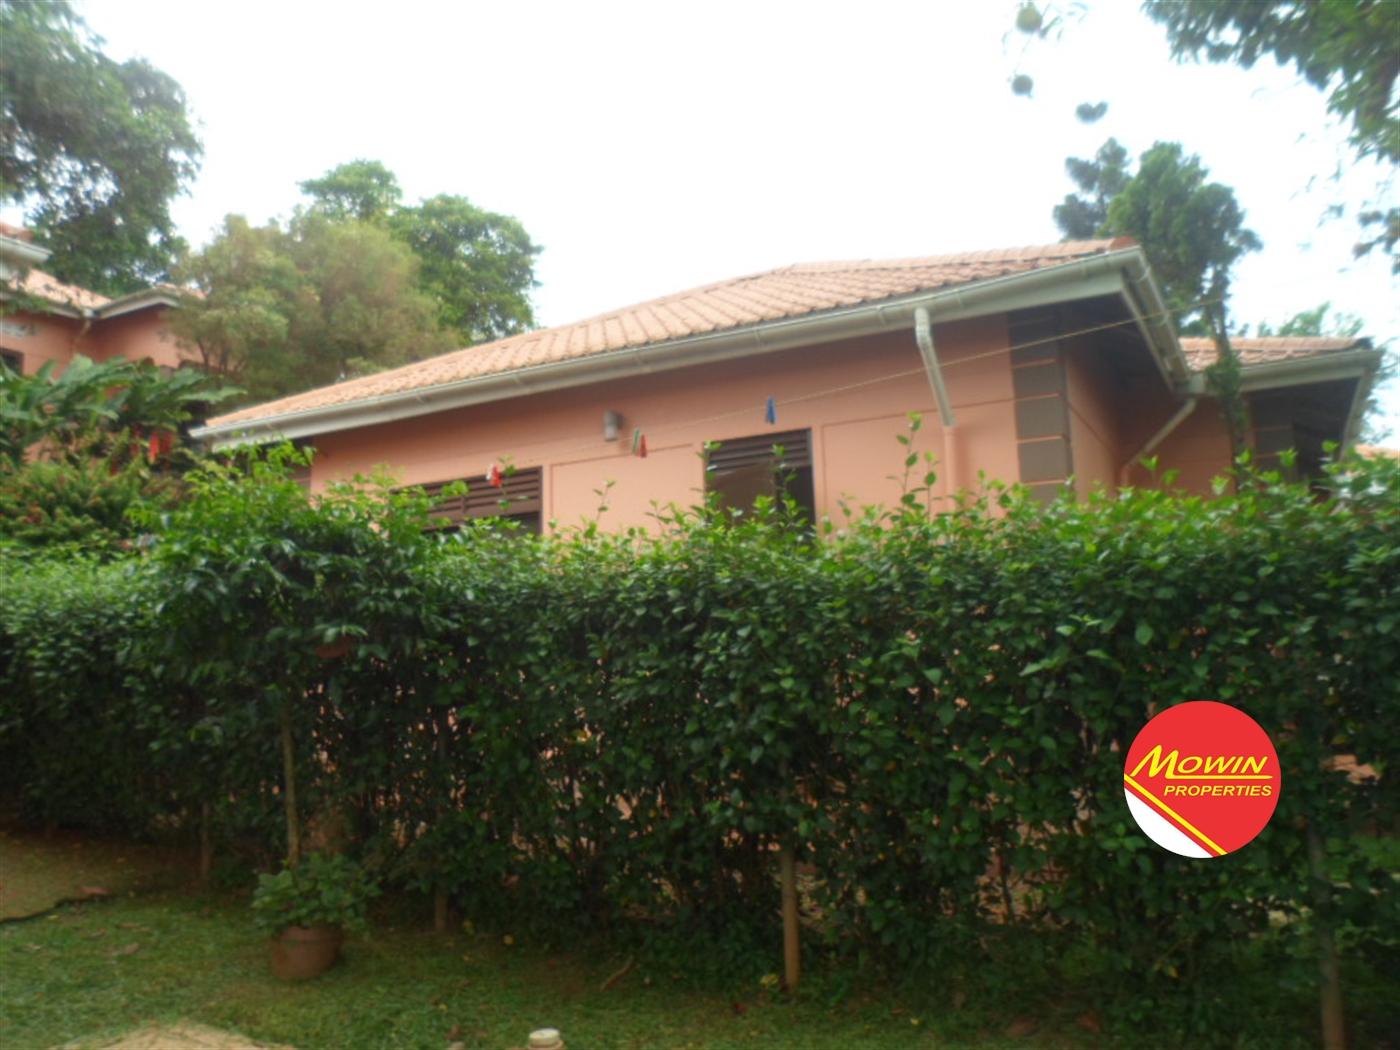 Bungalow for rent in Bwebajja Wakiso